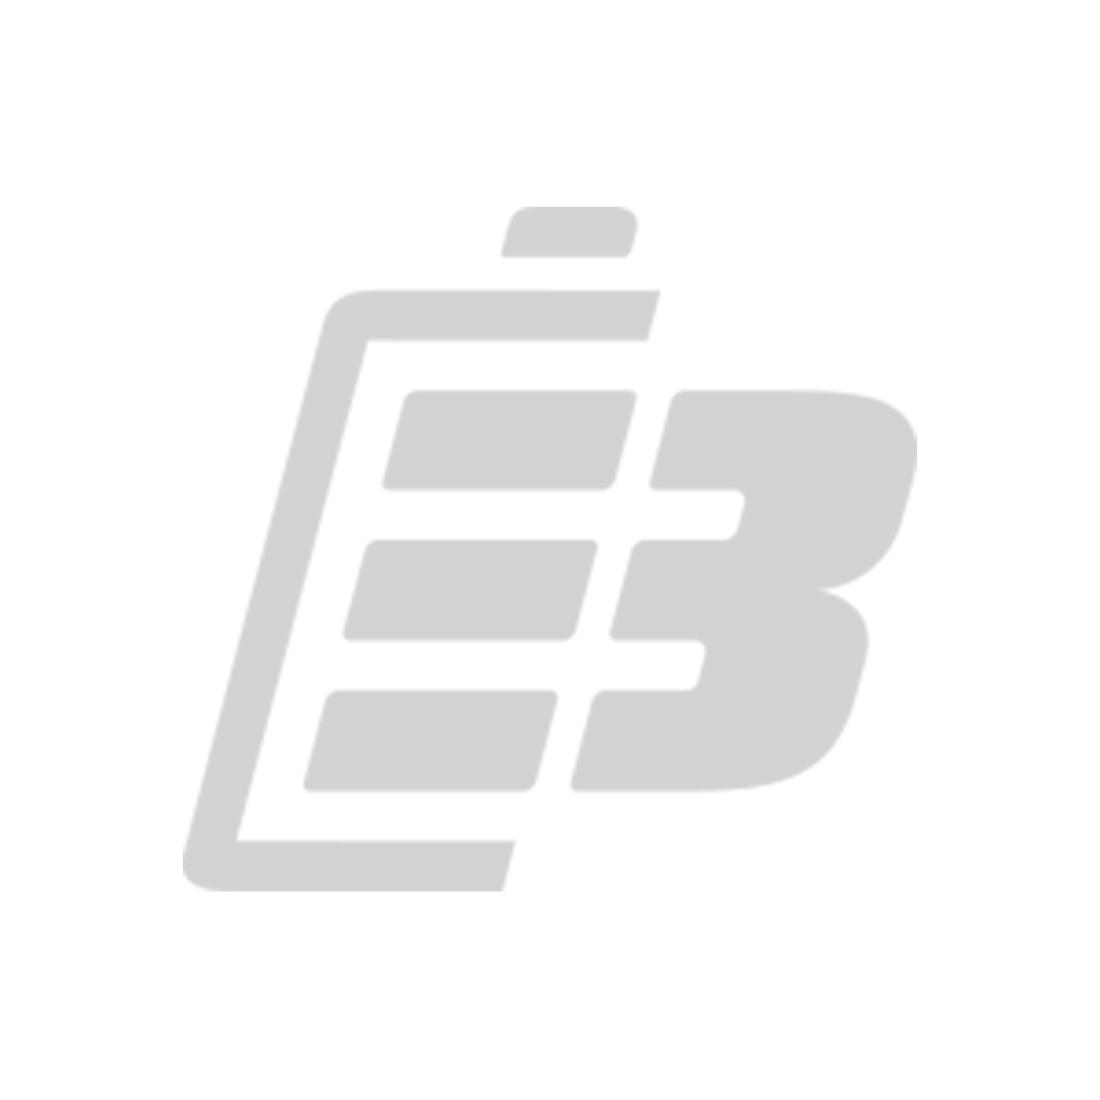 Fenix WT20R LED Flashlight